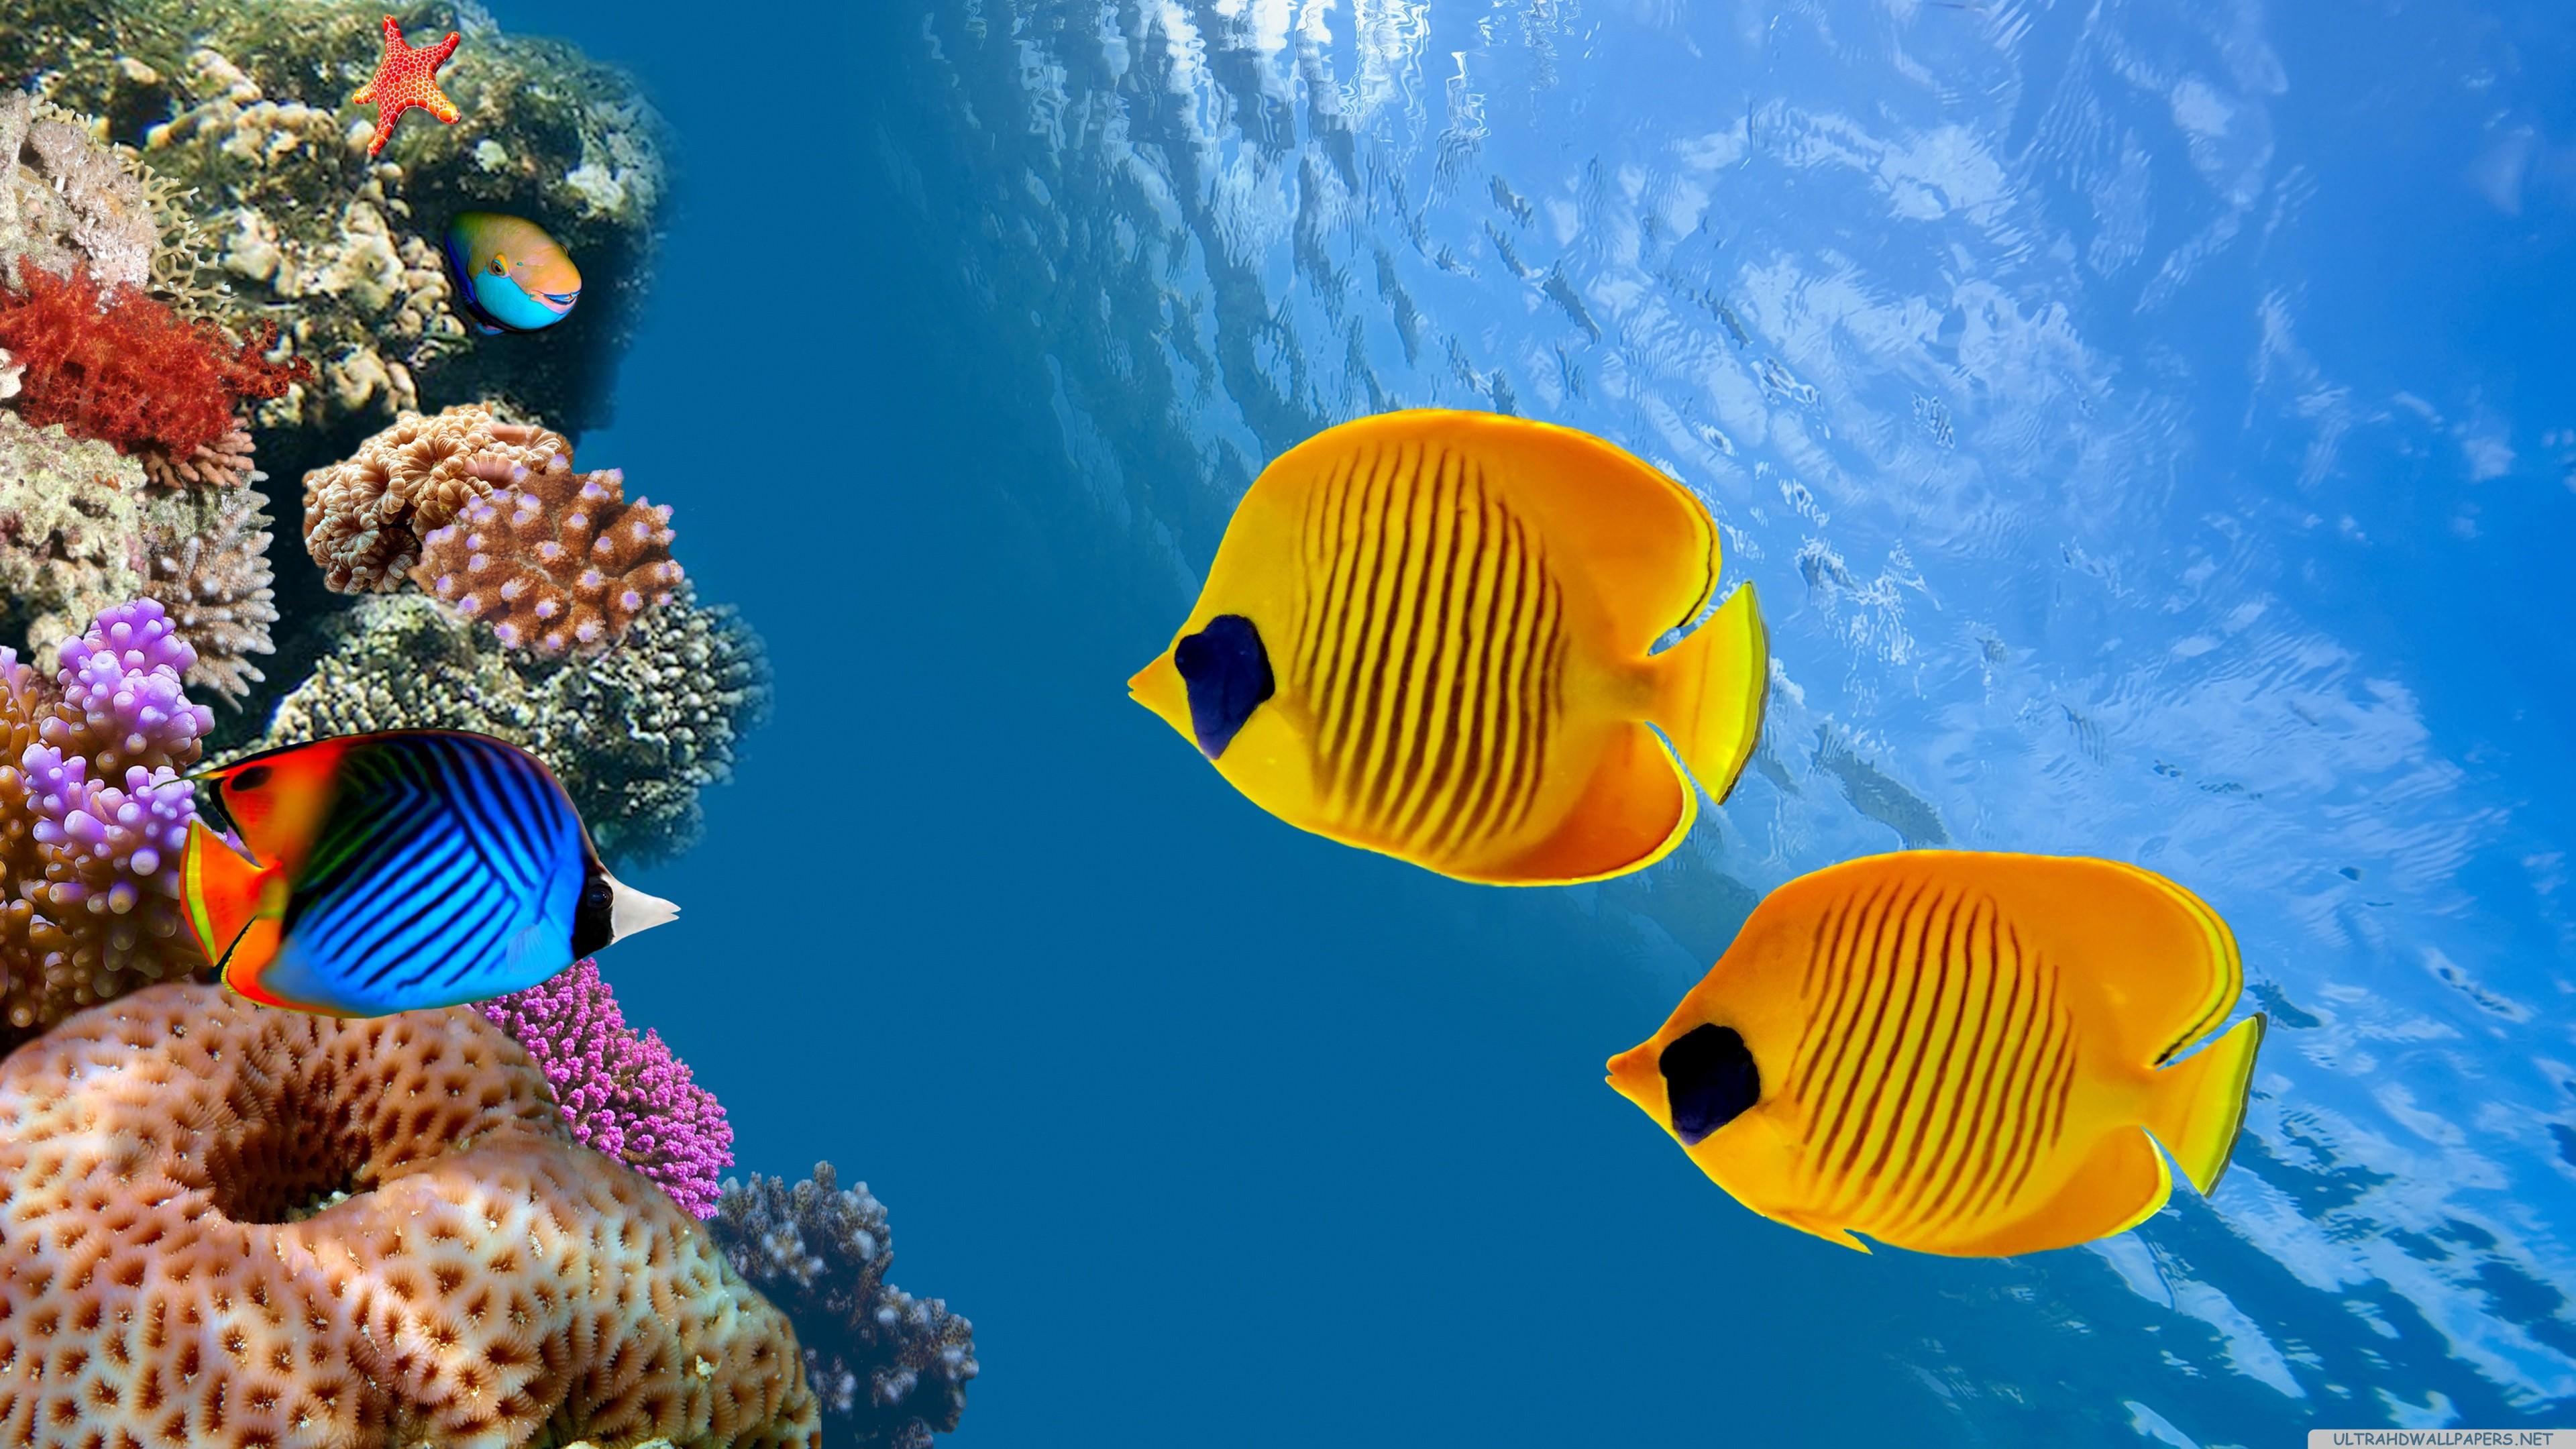 Sea Coral Blue Tropical Fish